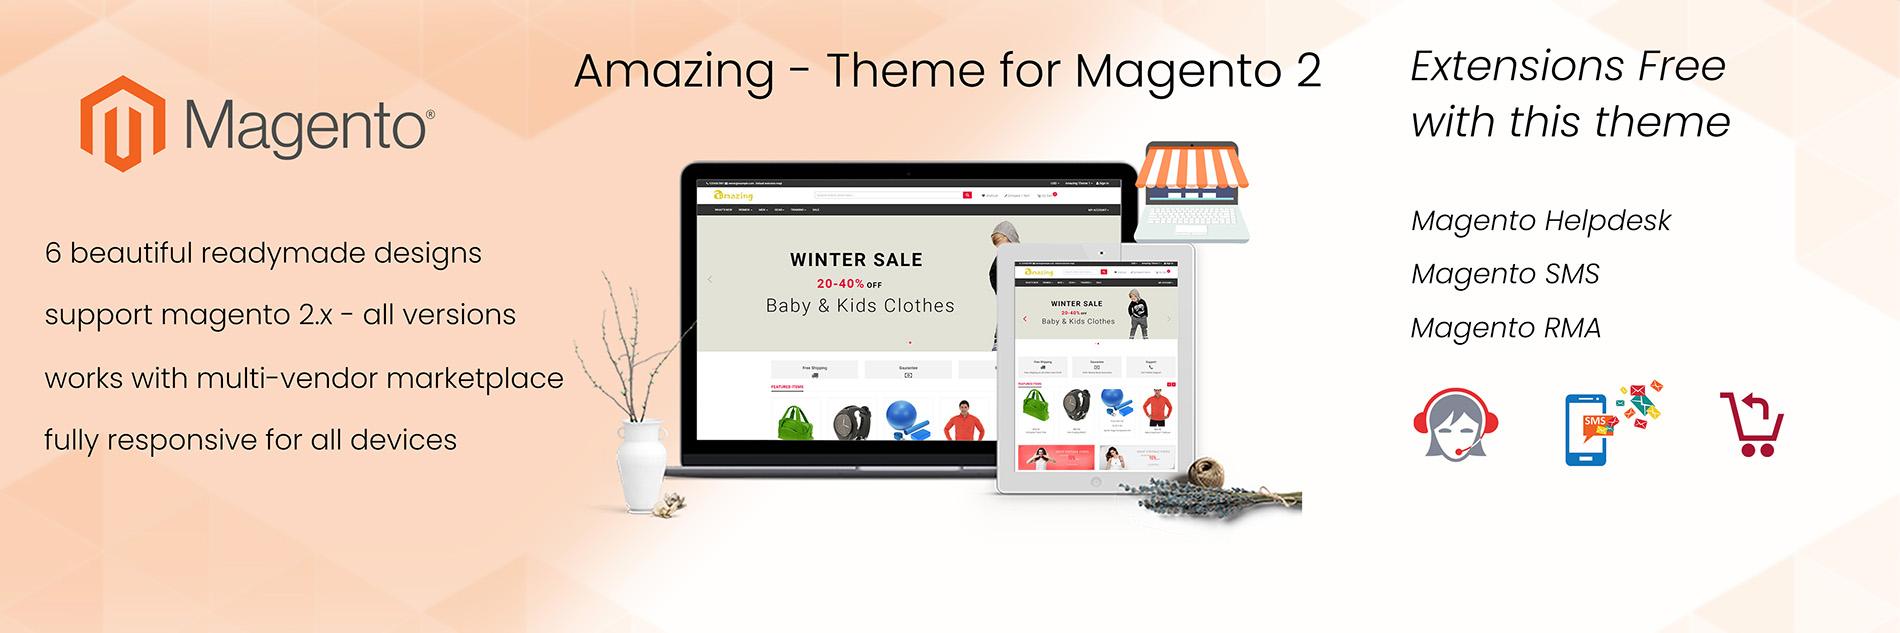 Amazon like theme for magento 2